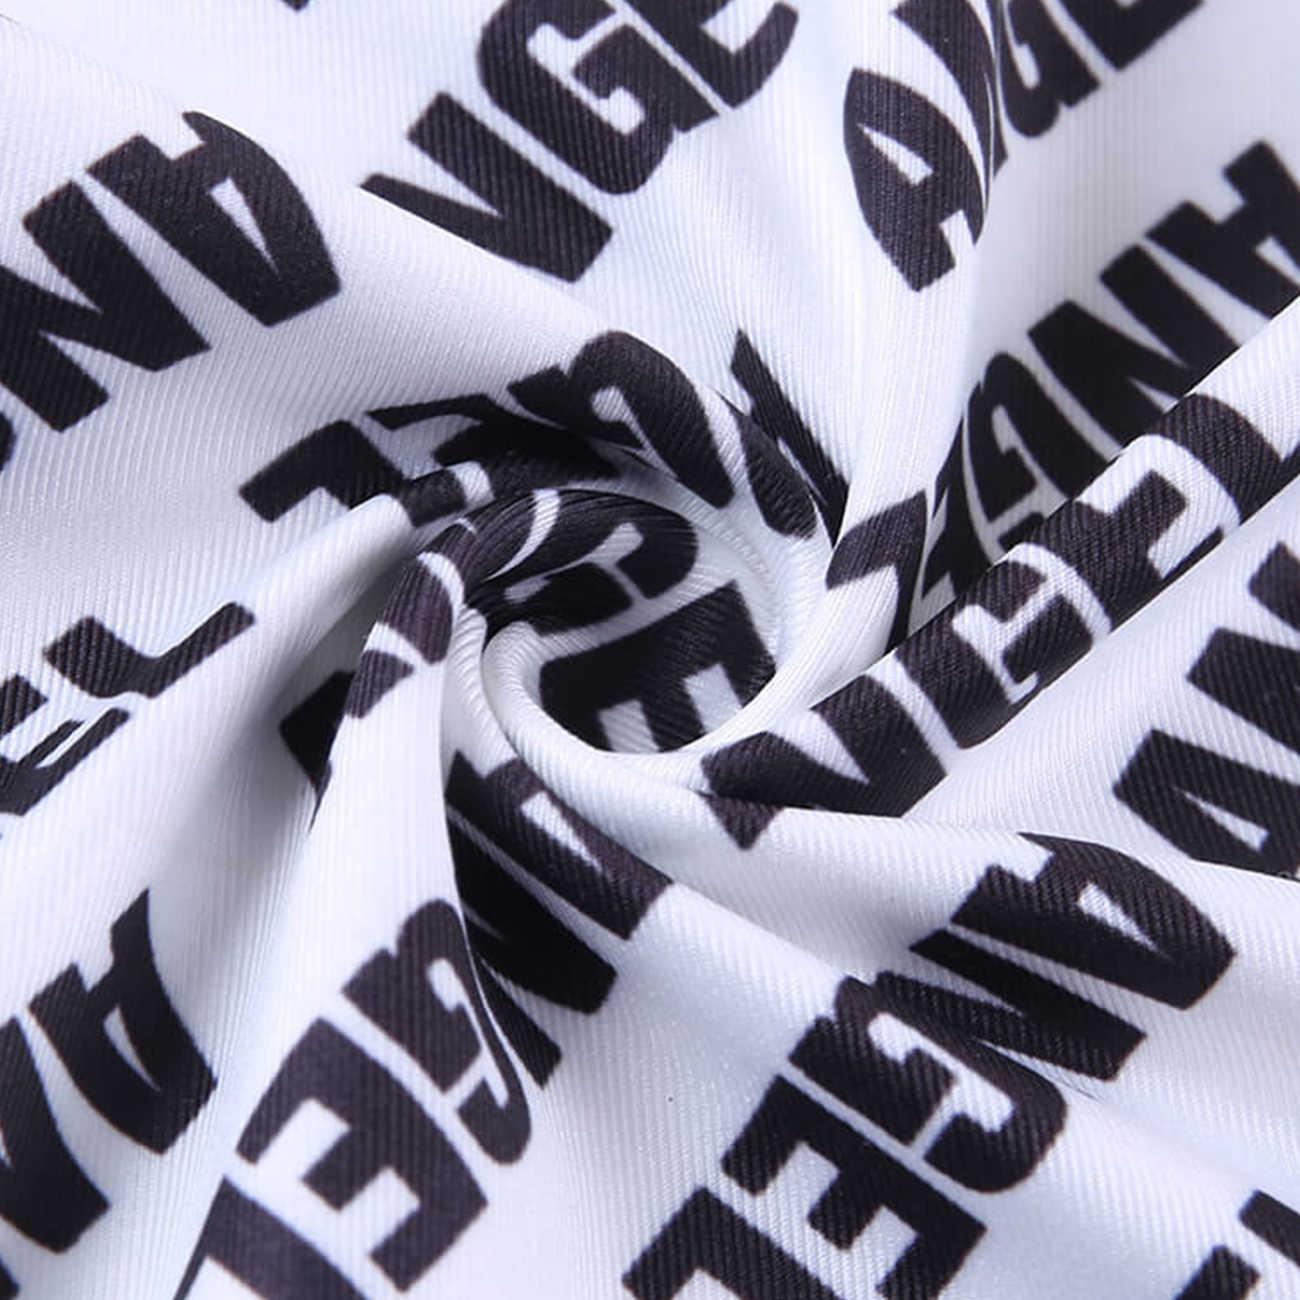 Aelfric Streetwear Harajuku Camiseta de cuello de tortuga 2020 verano Sexy Casual Camiseta de manga larga Tees de moda de algodón blanco carta de impresión